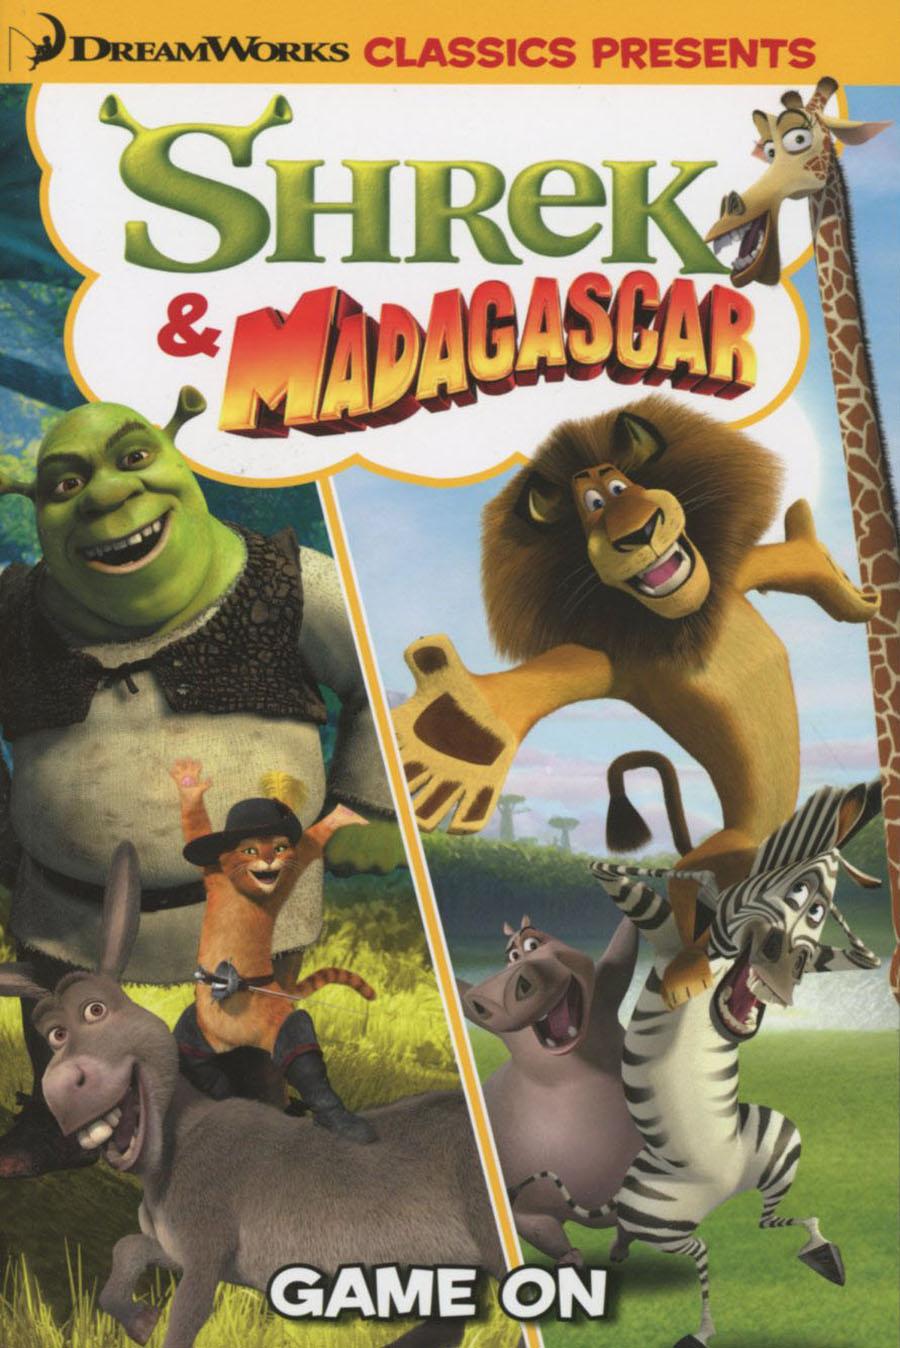 Dreamworks Classics Presents Vol 3 Shrek & Madagascar Game On TP